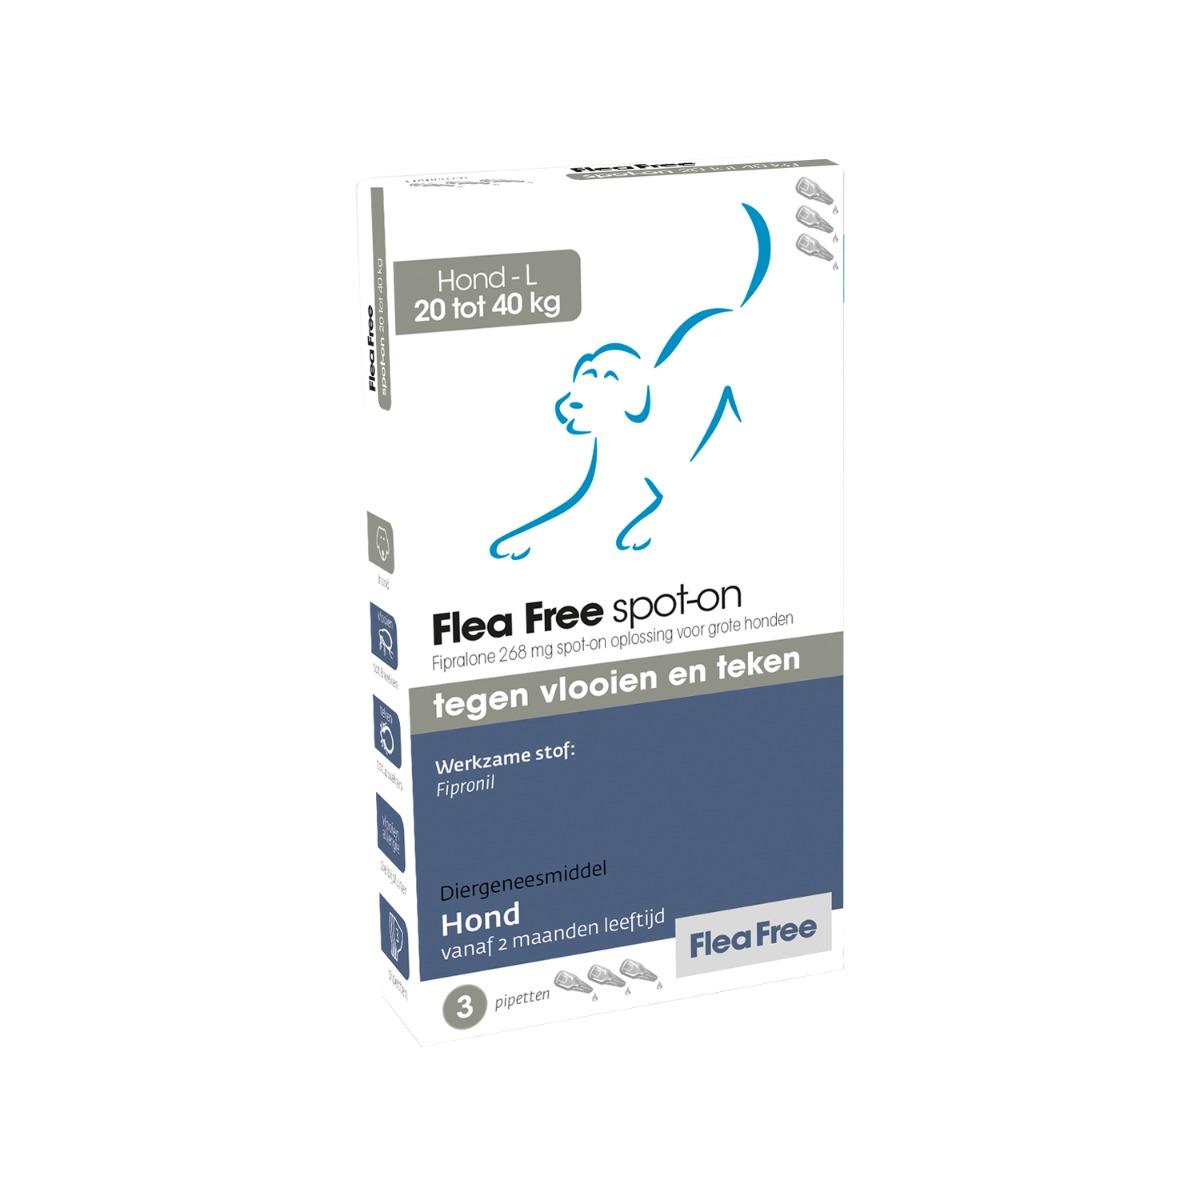 Flea Free Fipralone Spot-on Hund - 20 - 40 kg